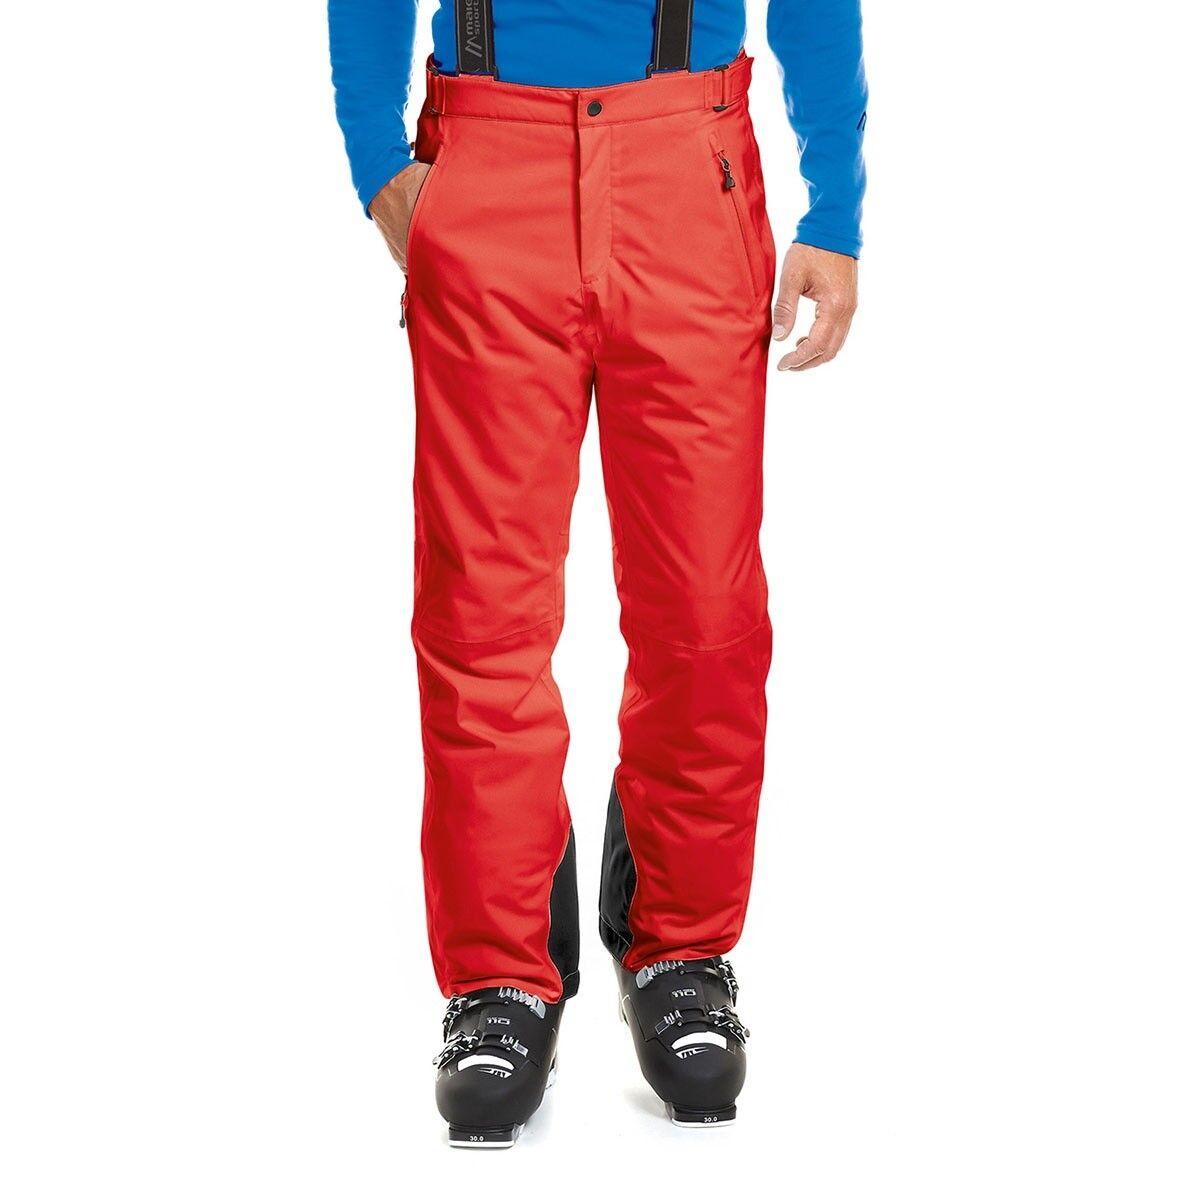 Maier Sports Anton 2 Skihose red